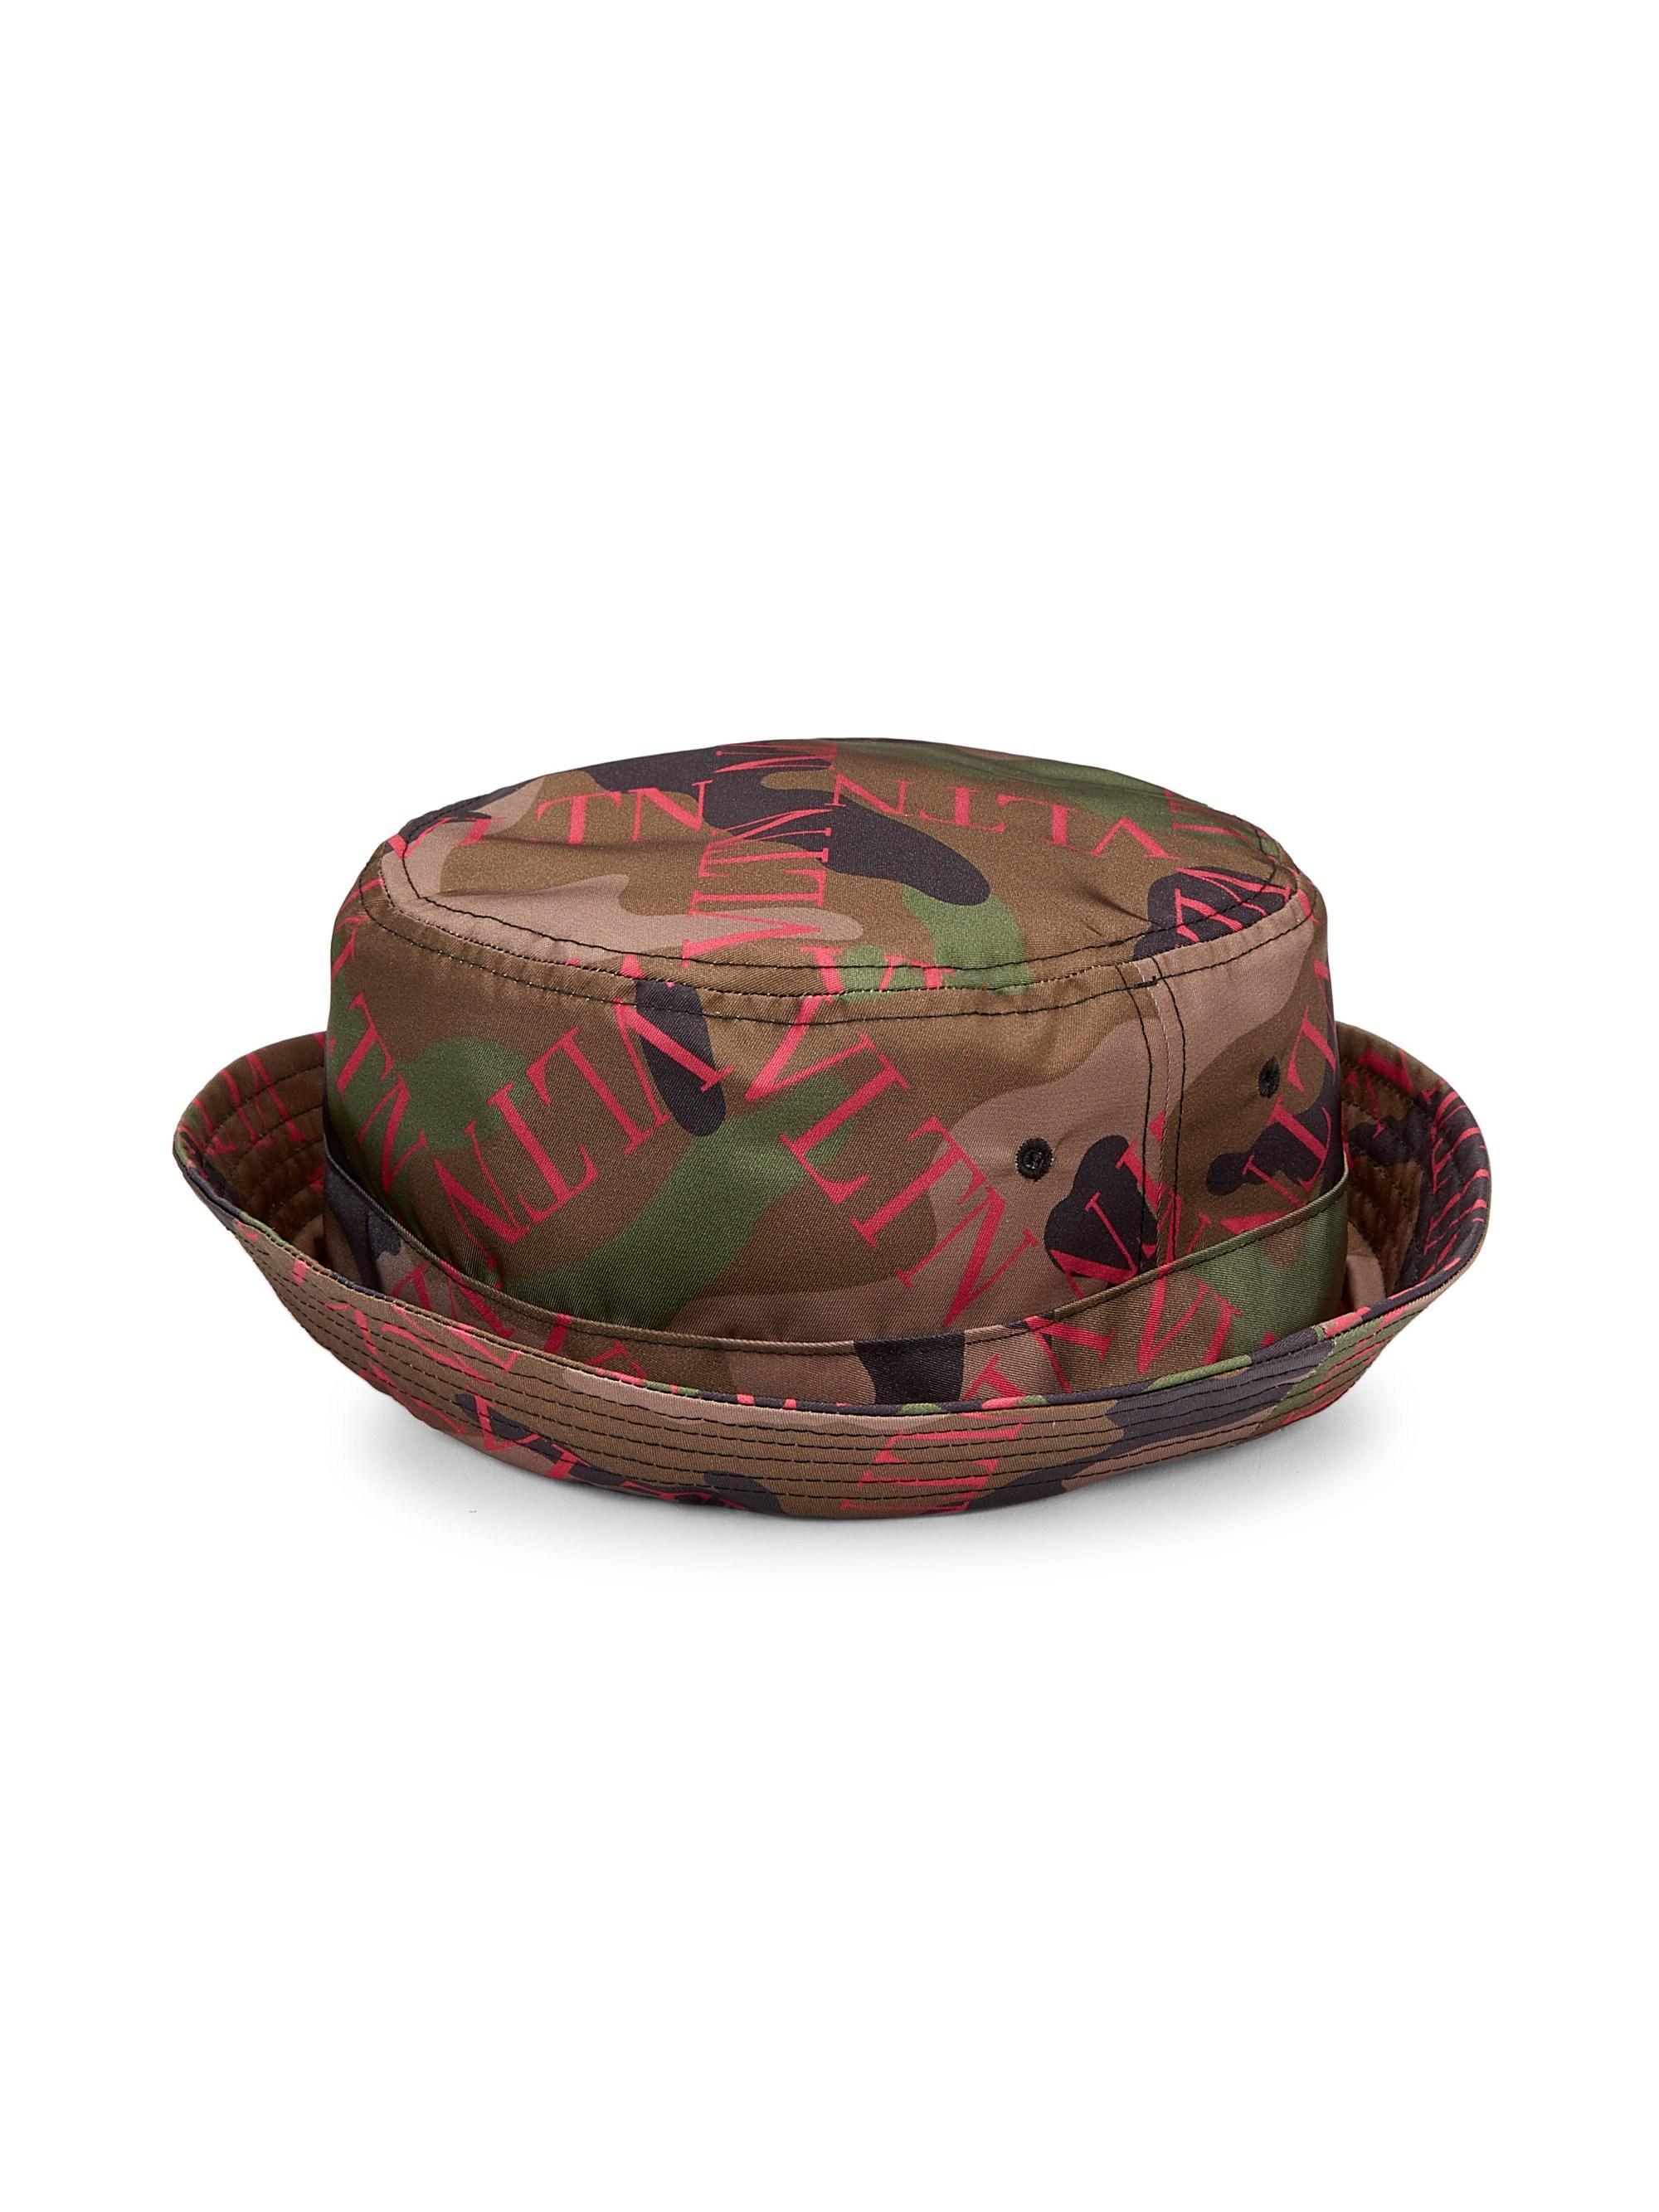 90944221dec Lyst - Valentino Men s Logo Camo Bucket Hat - Army Green Pink - Size ...